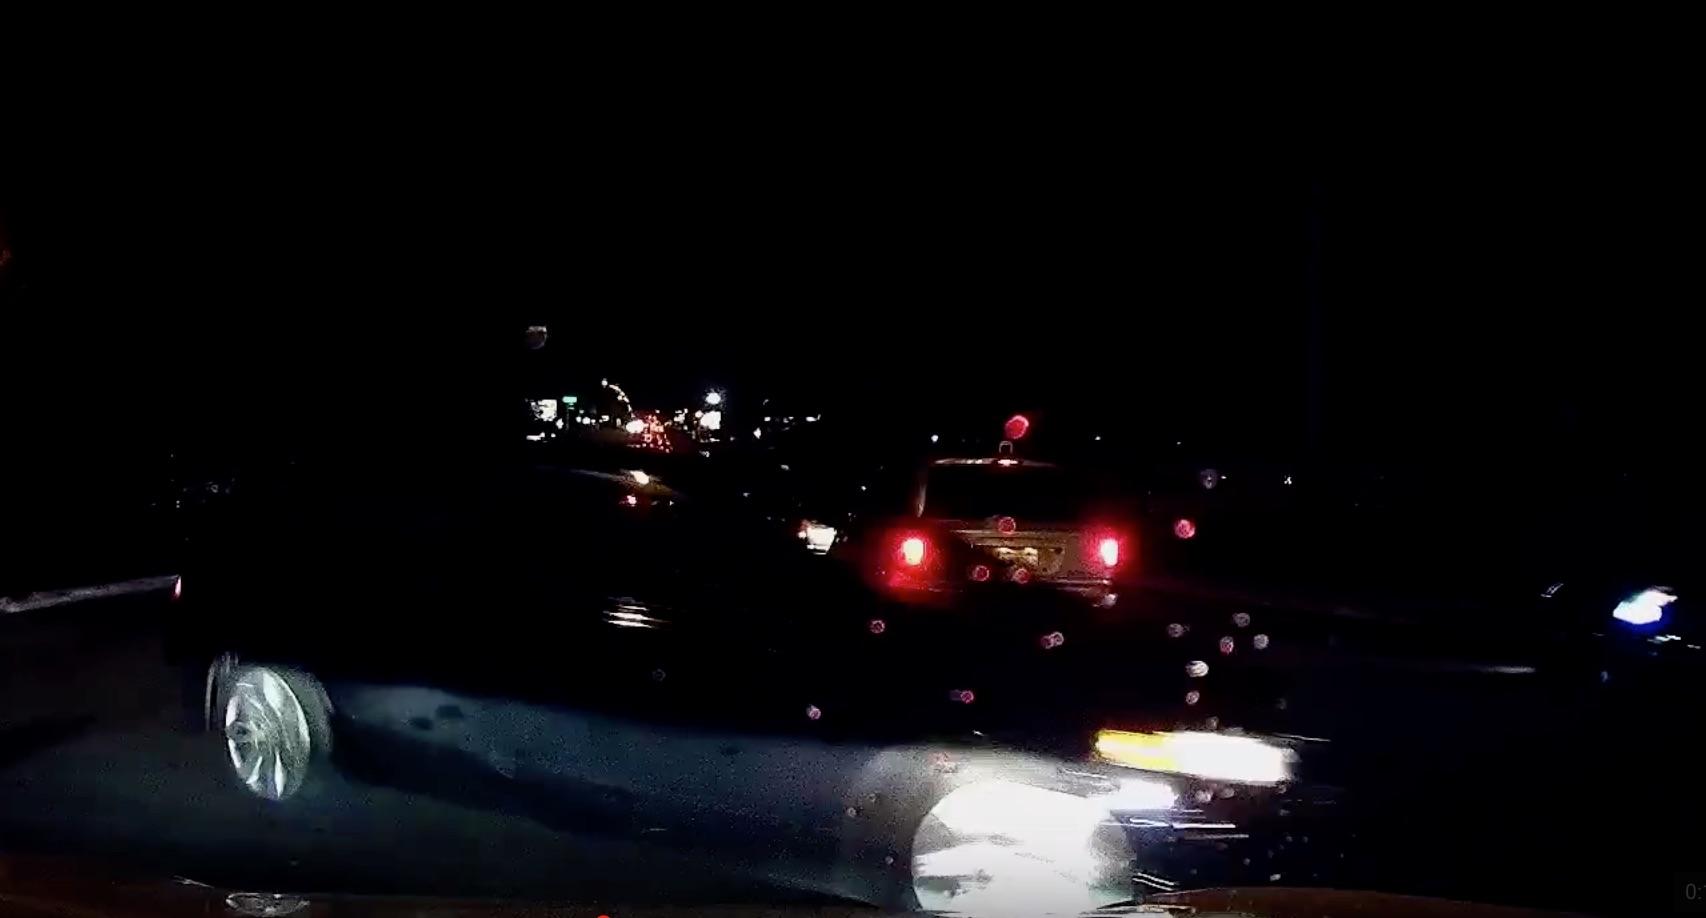 Tesla-Autopilot-Emergency-Braking-Collision